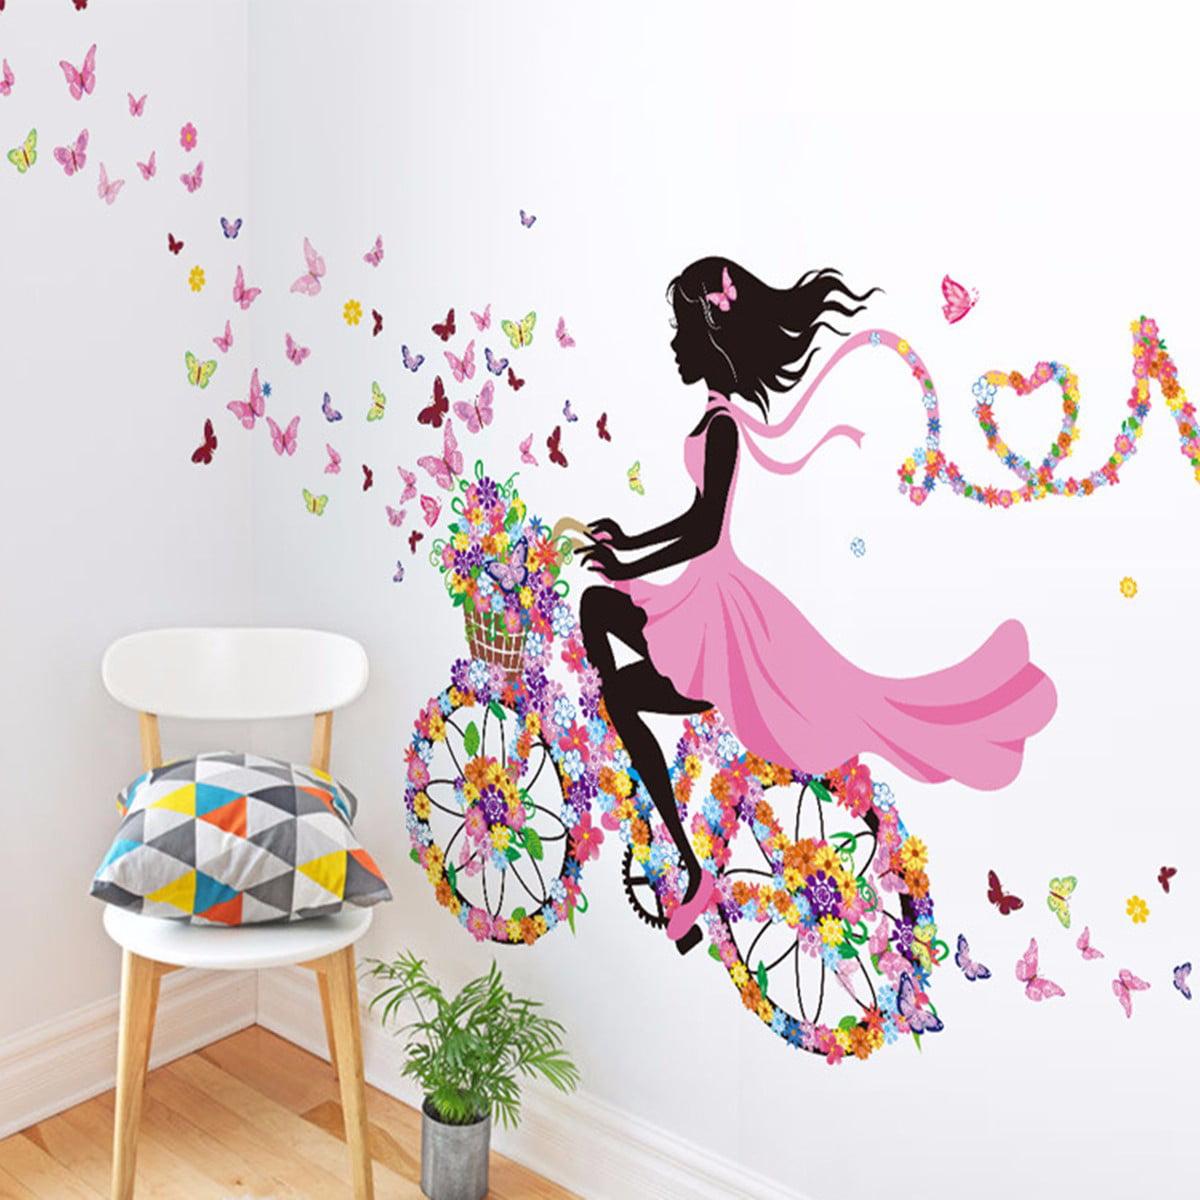 Flower Girl Removable Wall Art Sticker Vinyl Decal Diy Bedroom Living Room Home Mural Decor Walmart Canada